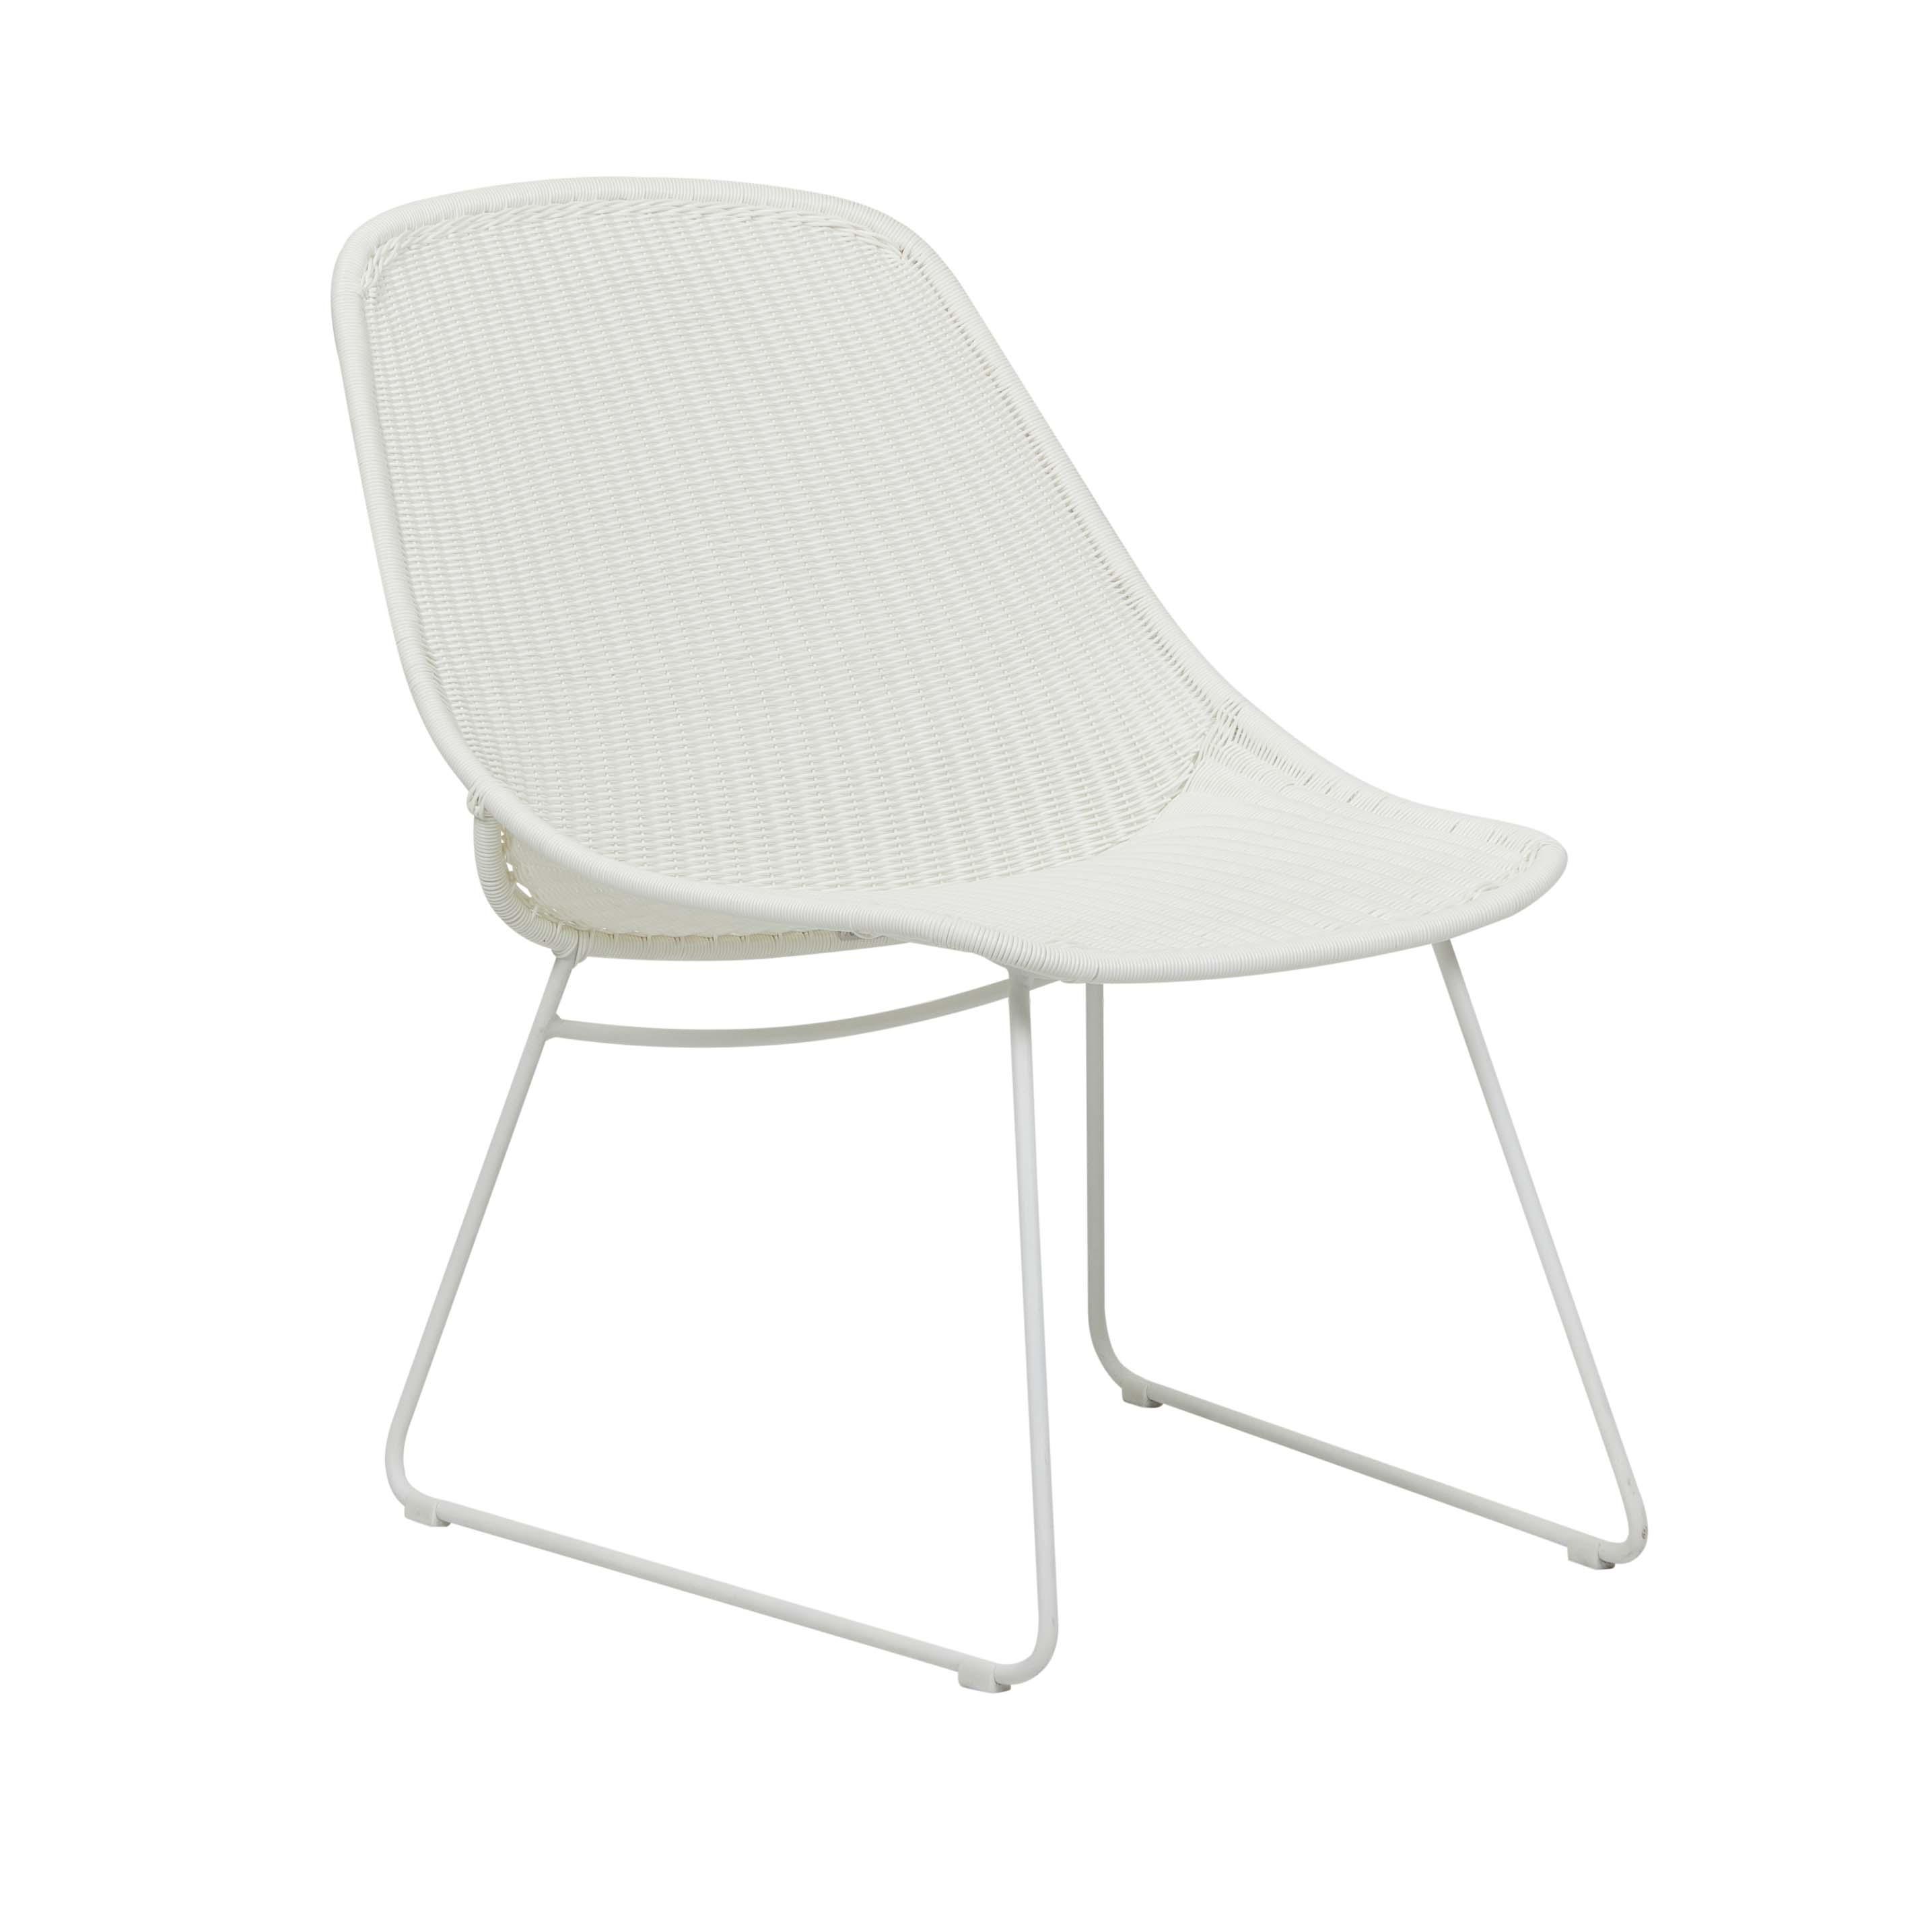 Furniture Hero-Images Occasional-Chairs granada-scoop-closed-weave-01